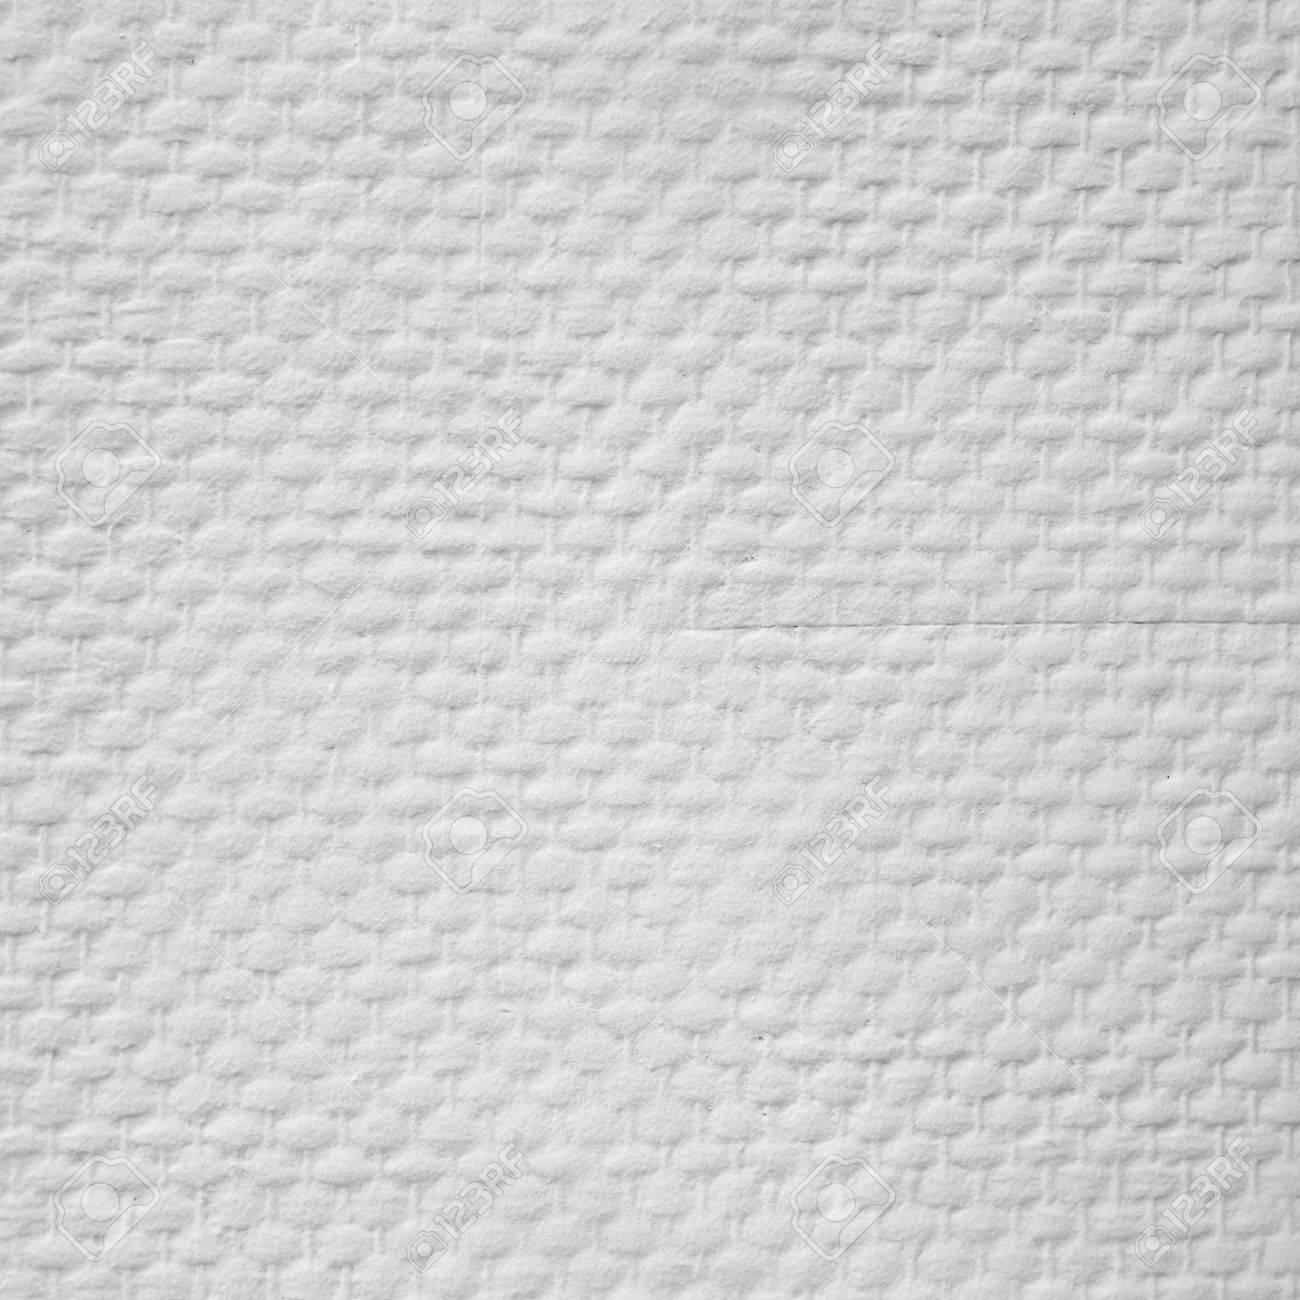 Textured paintable wallpaper - Macro Textured Paintable Wallpaper Printed With Gray Paint Stock Photo 28778241